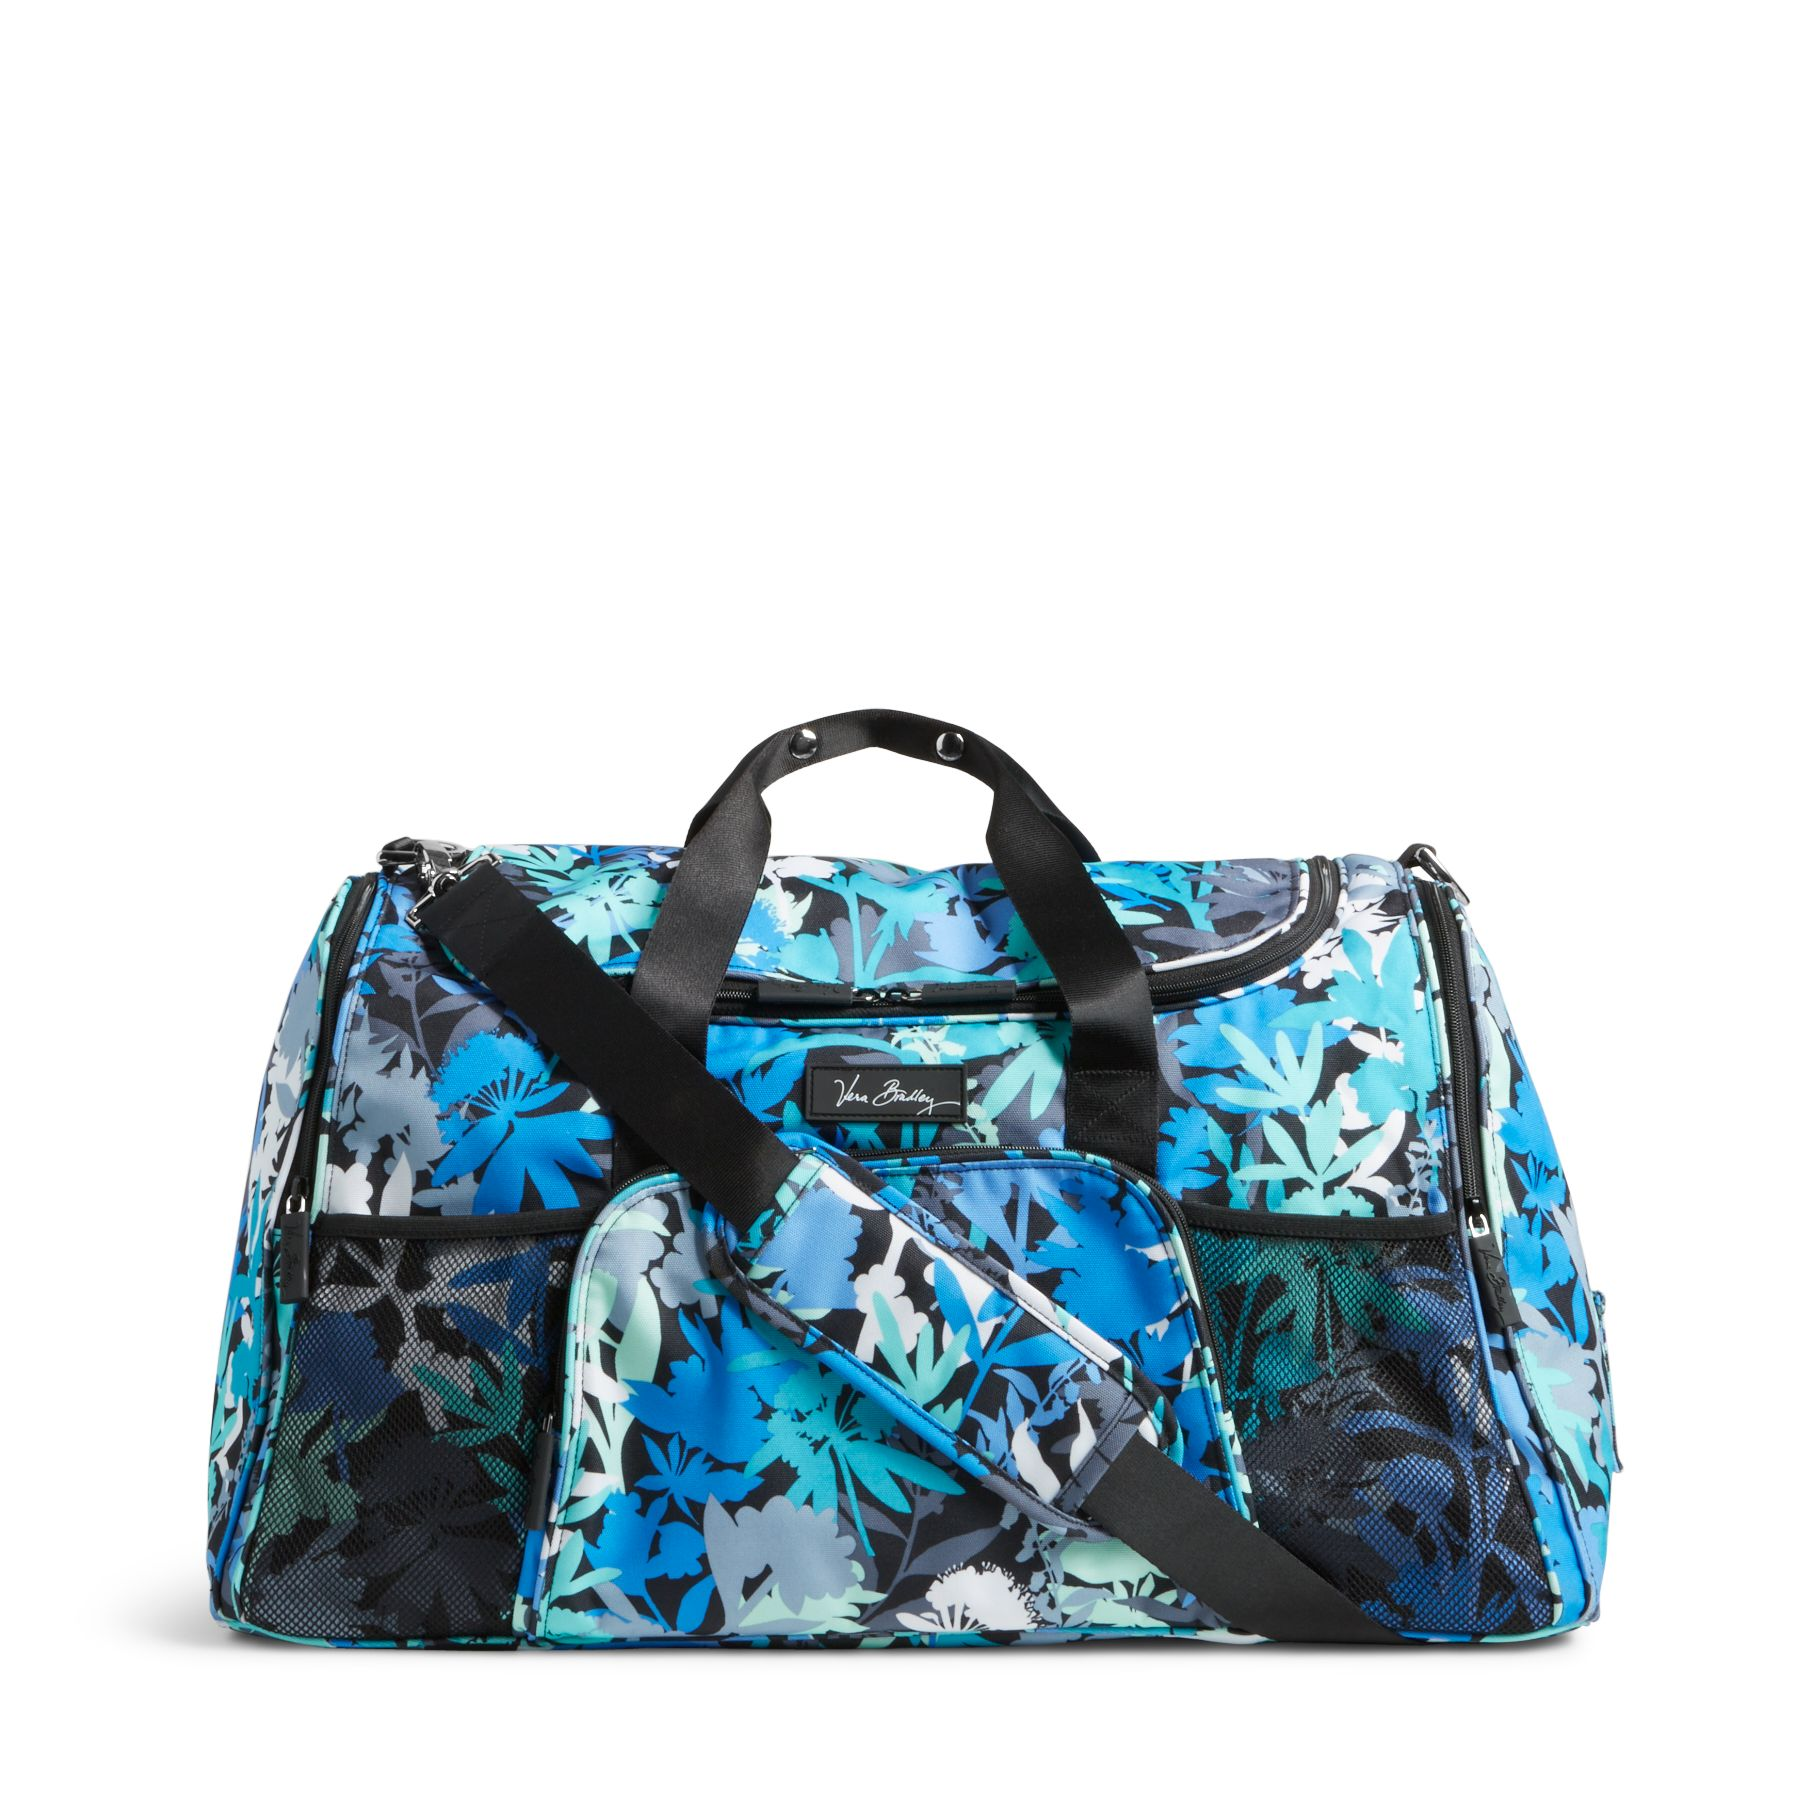 Upc 886003354360 Vera Bradley Luggage Ultimate Sport Bag Camo